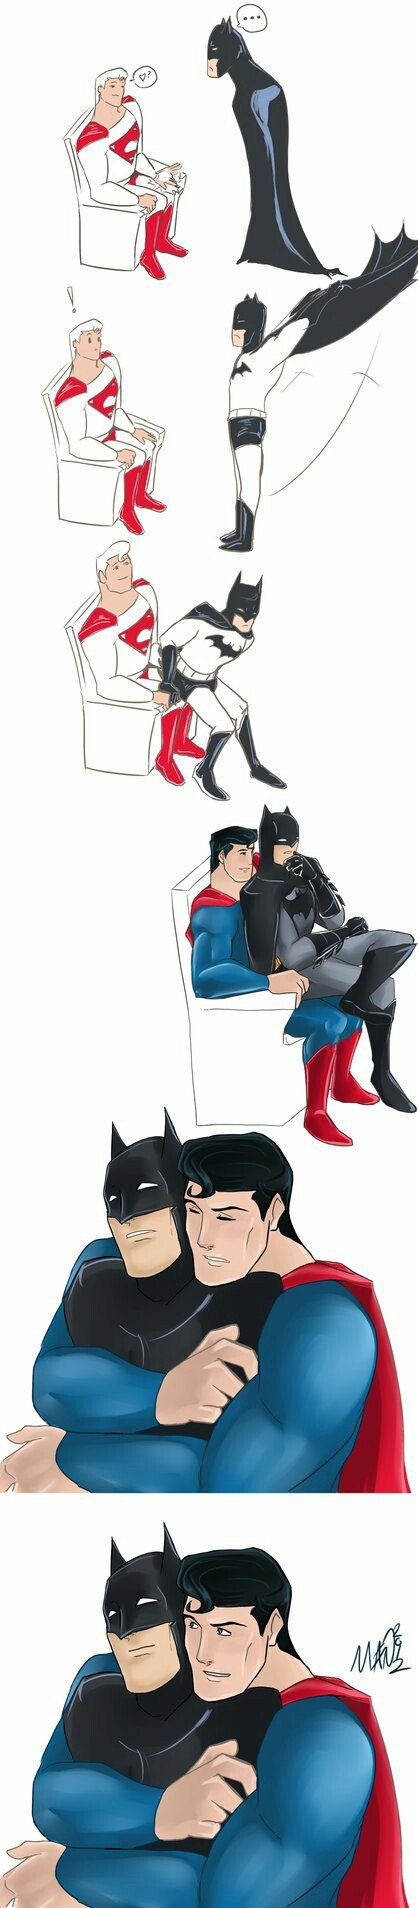 7/24/17   11:09a  DC Superman/Clark Kent Batman/Bruce Wayne Changes